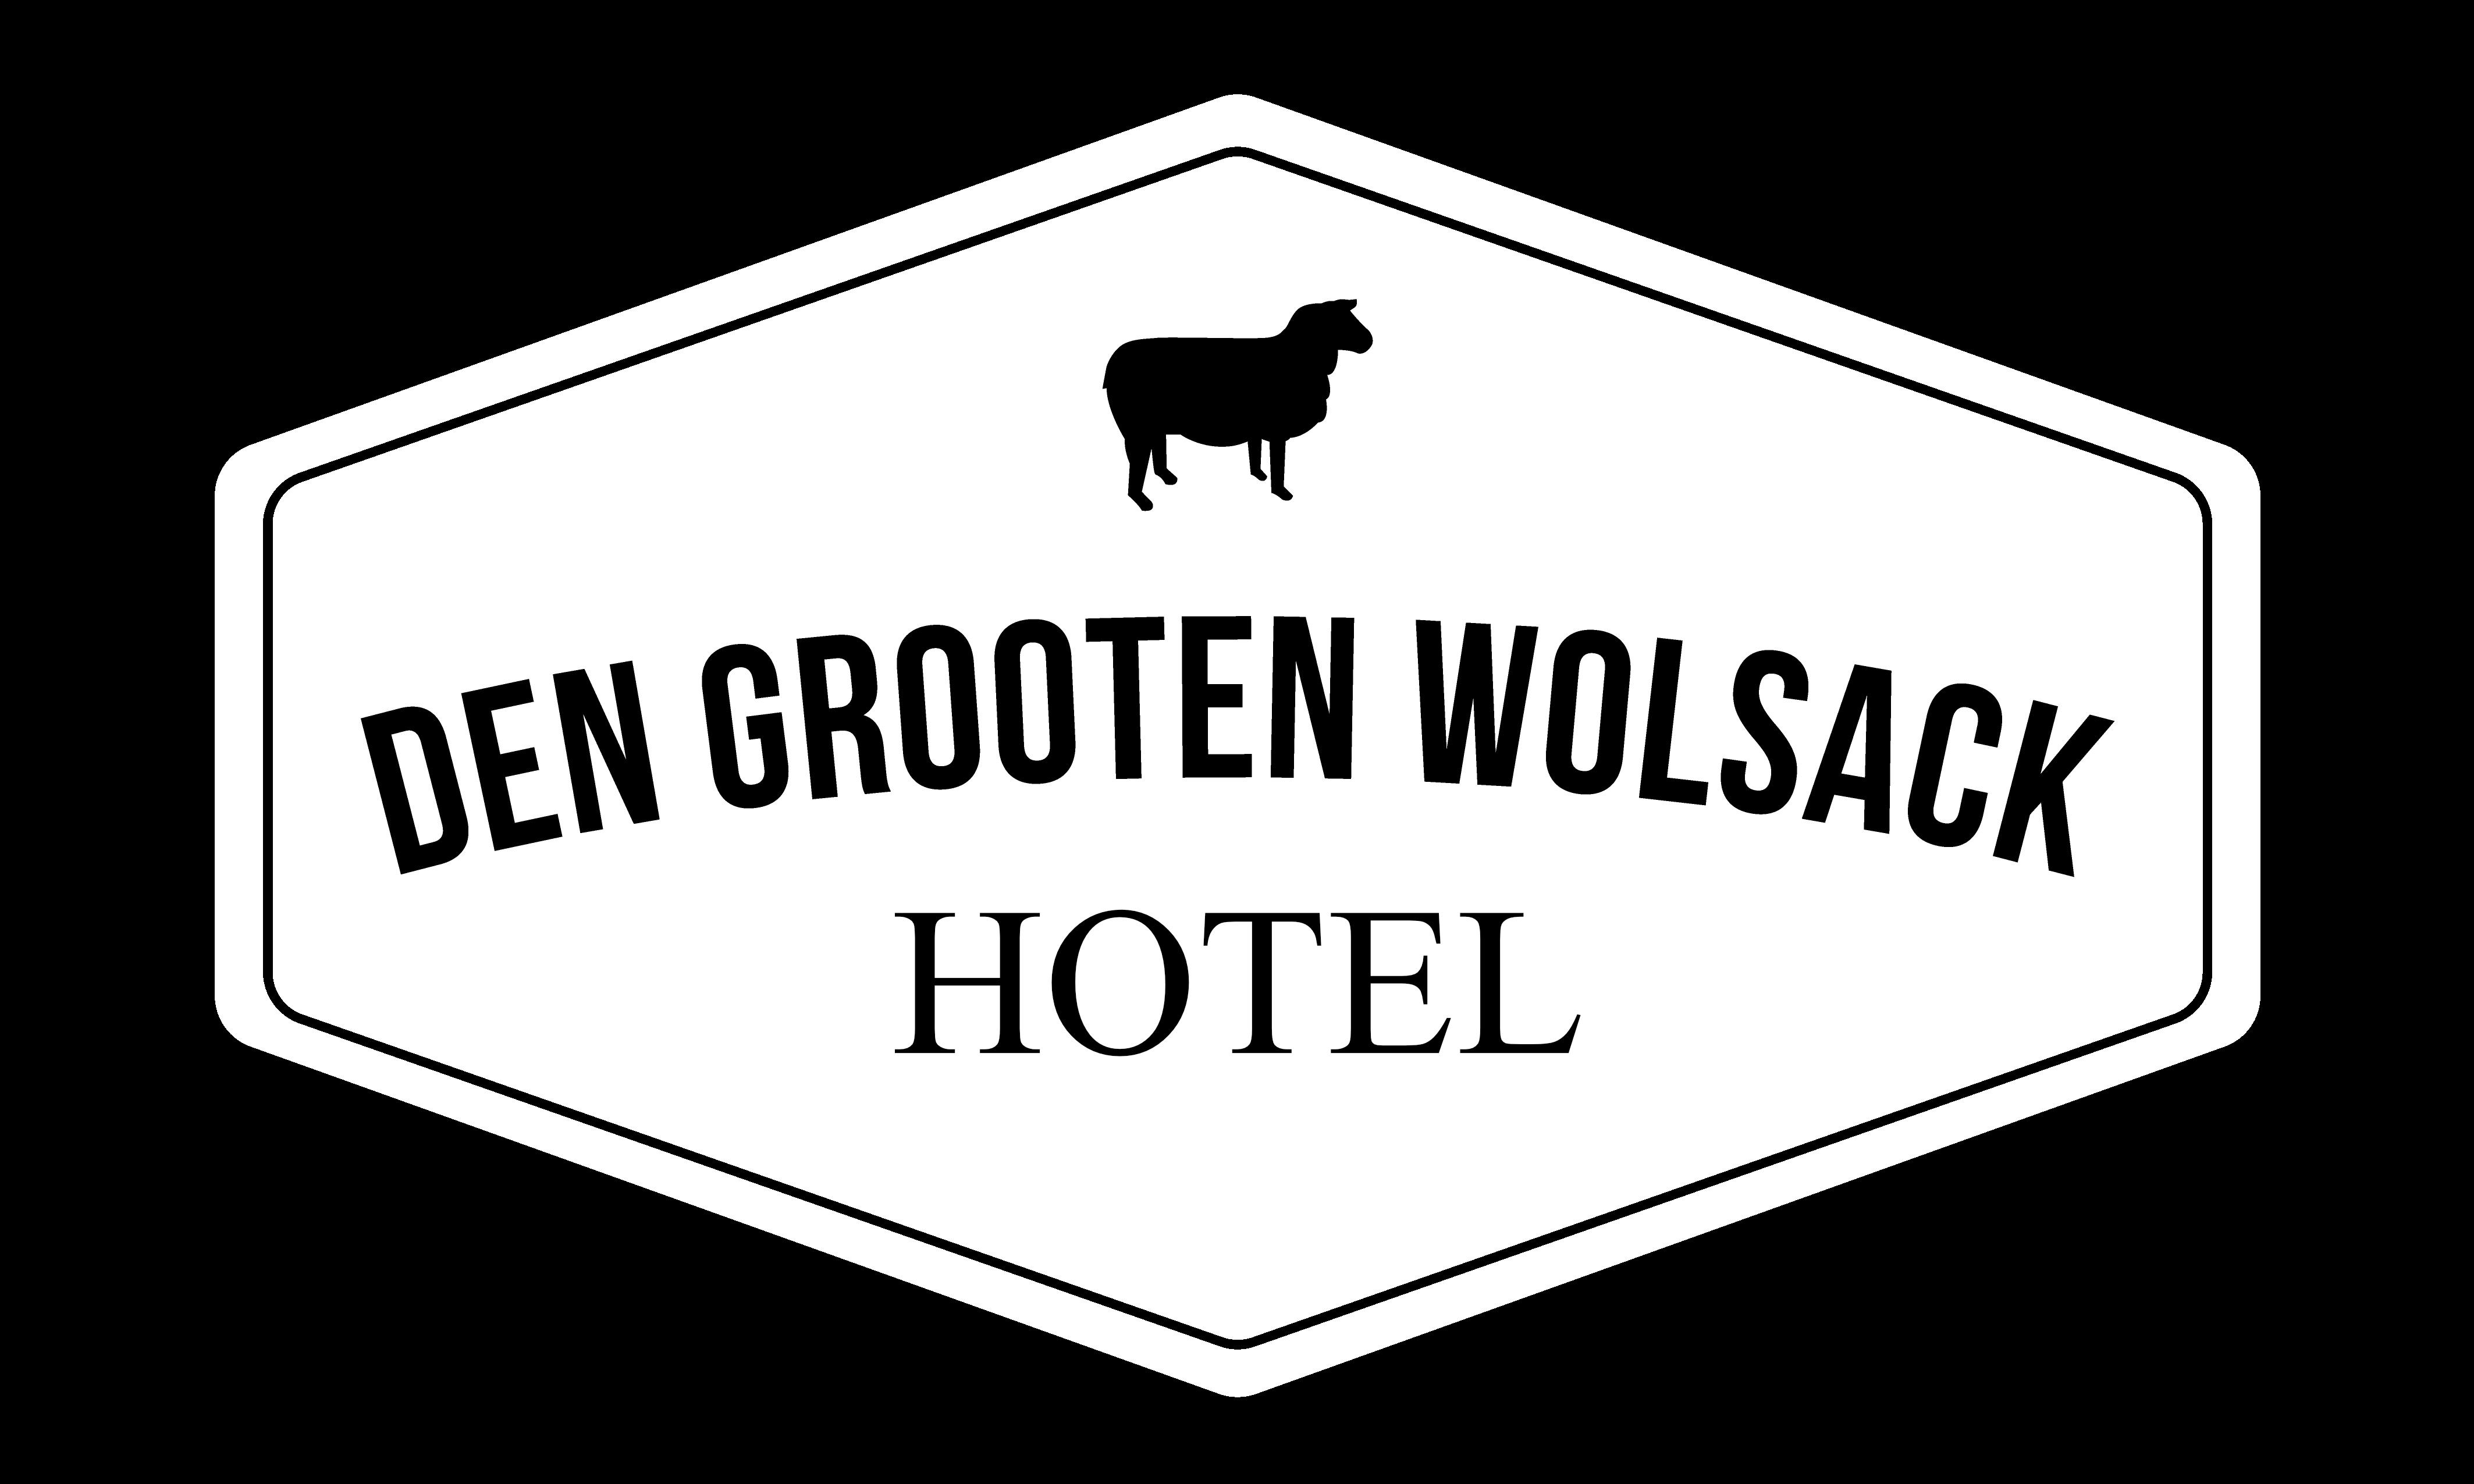 Den Grooten Wolsack